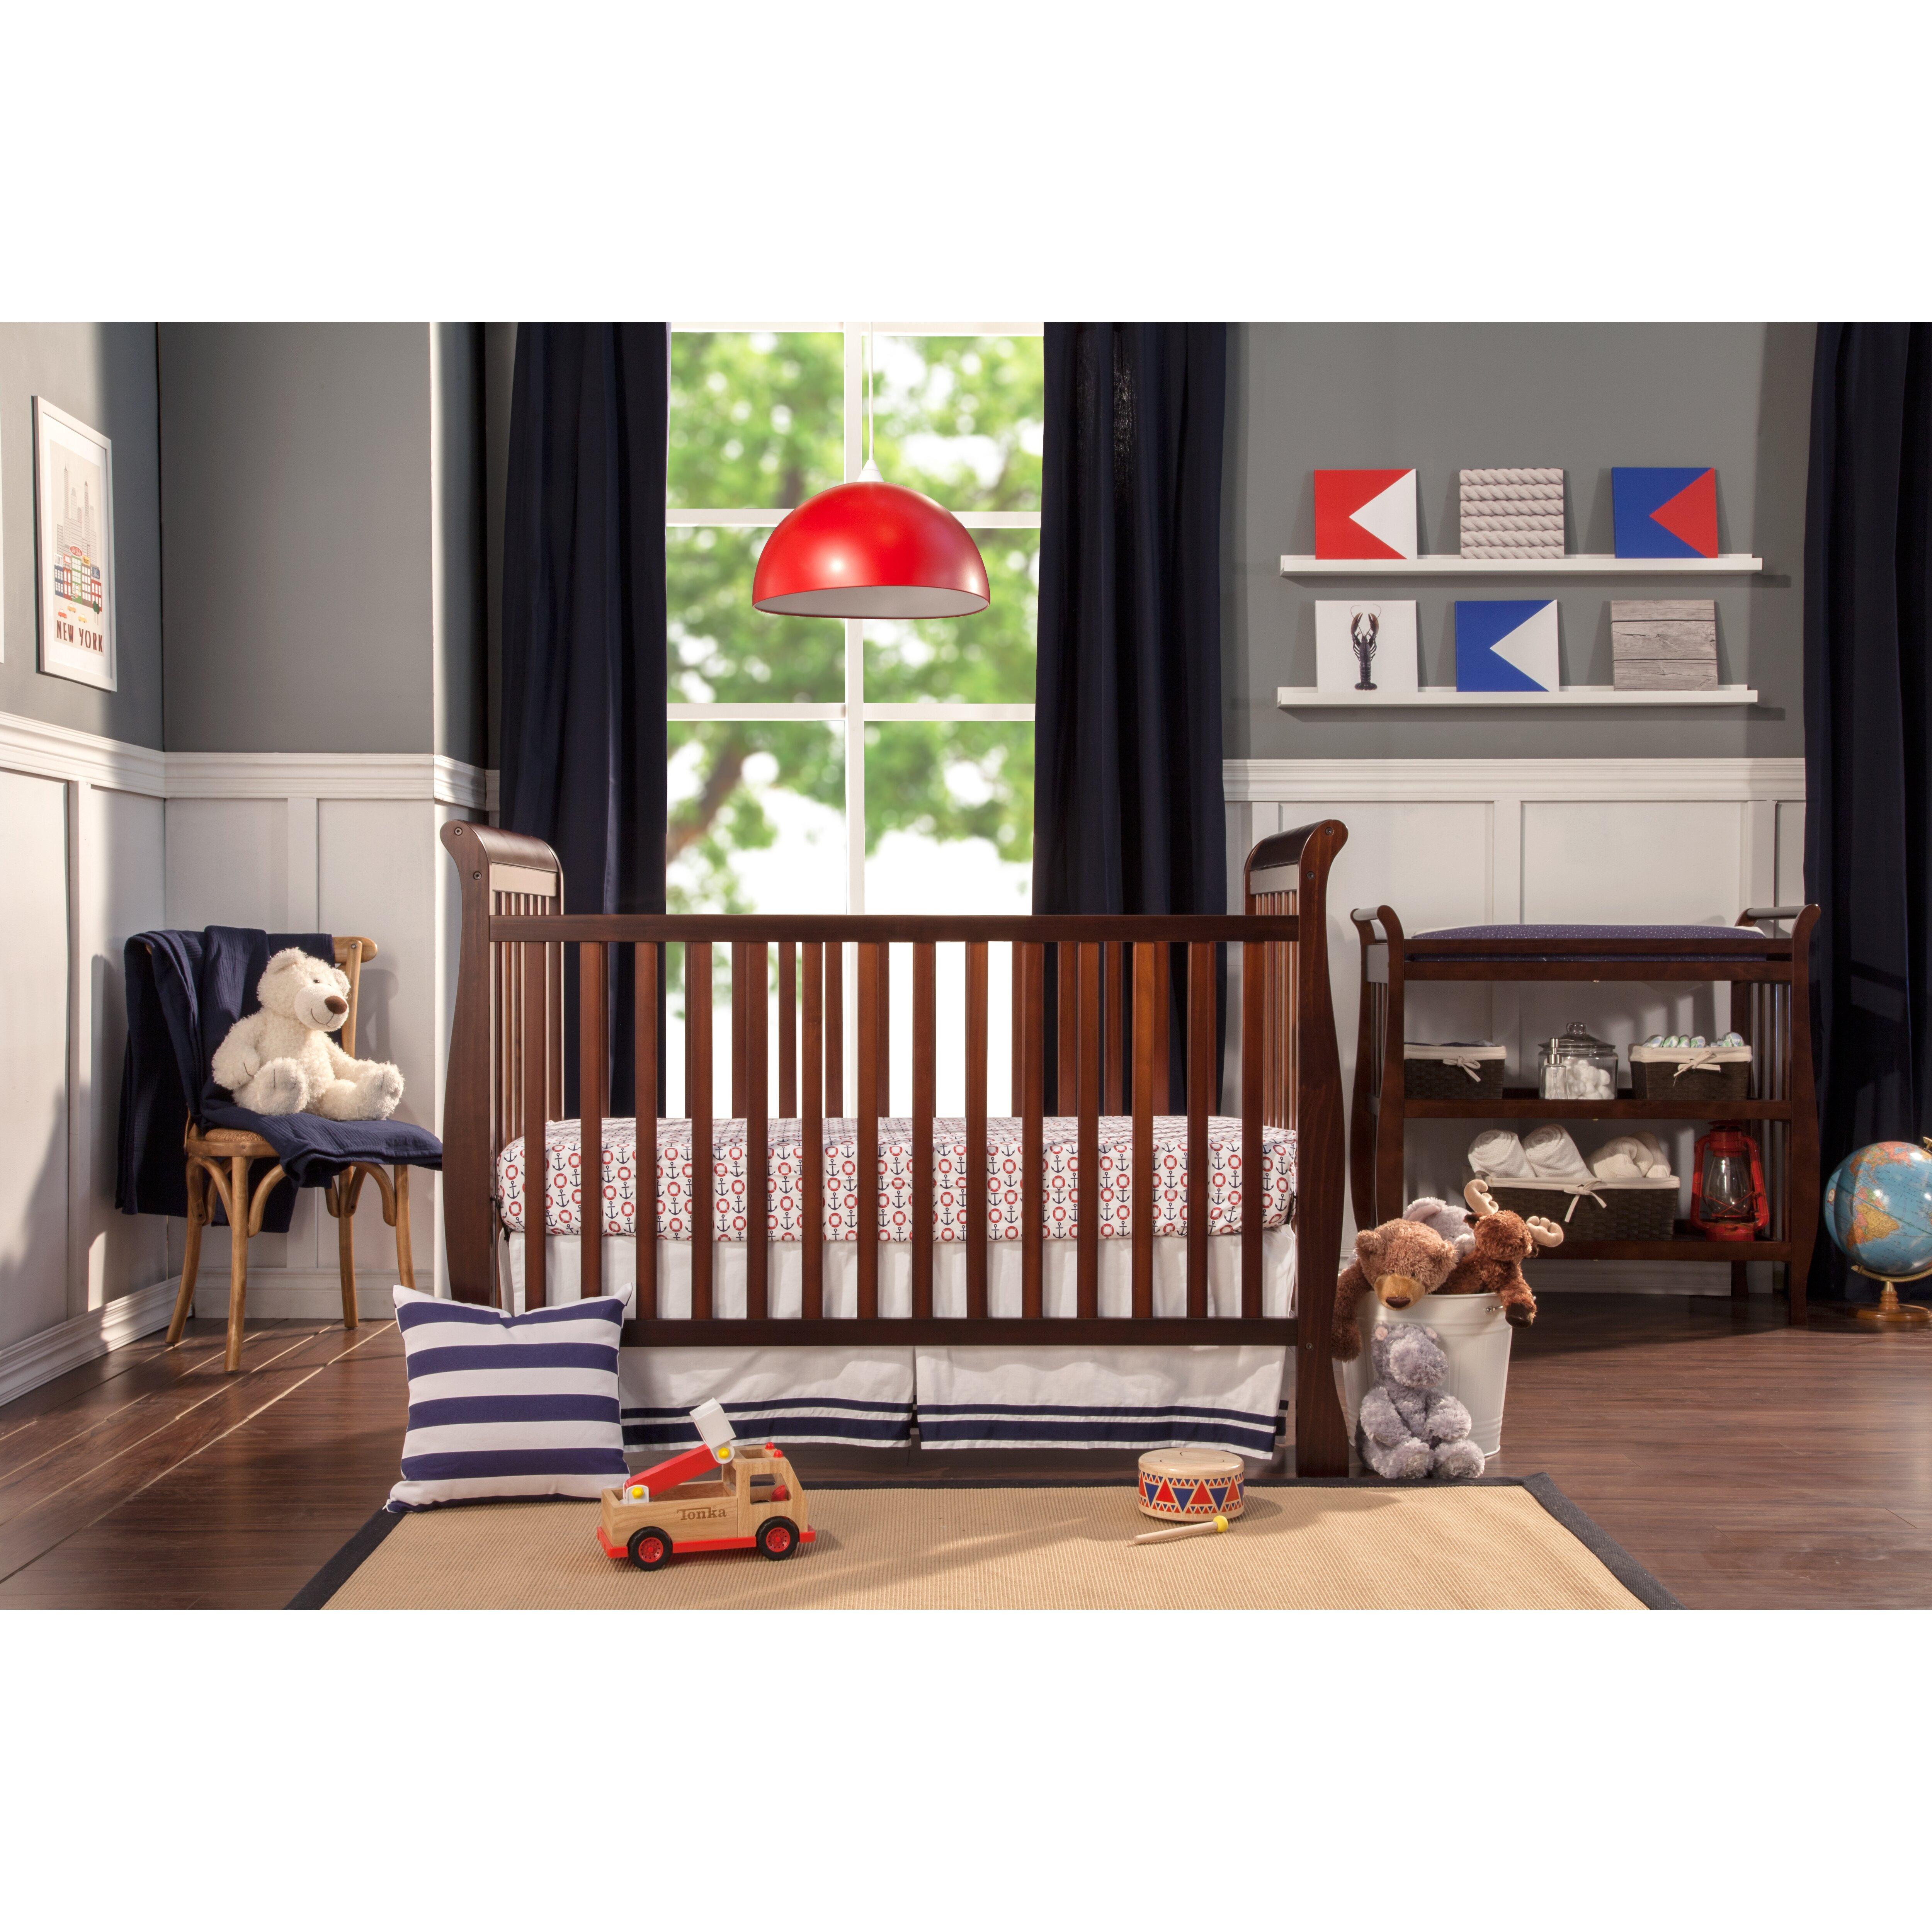 Ellery round crib for sale - Davinci Jamie Convertible Crib